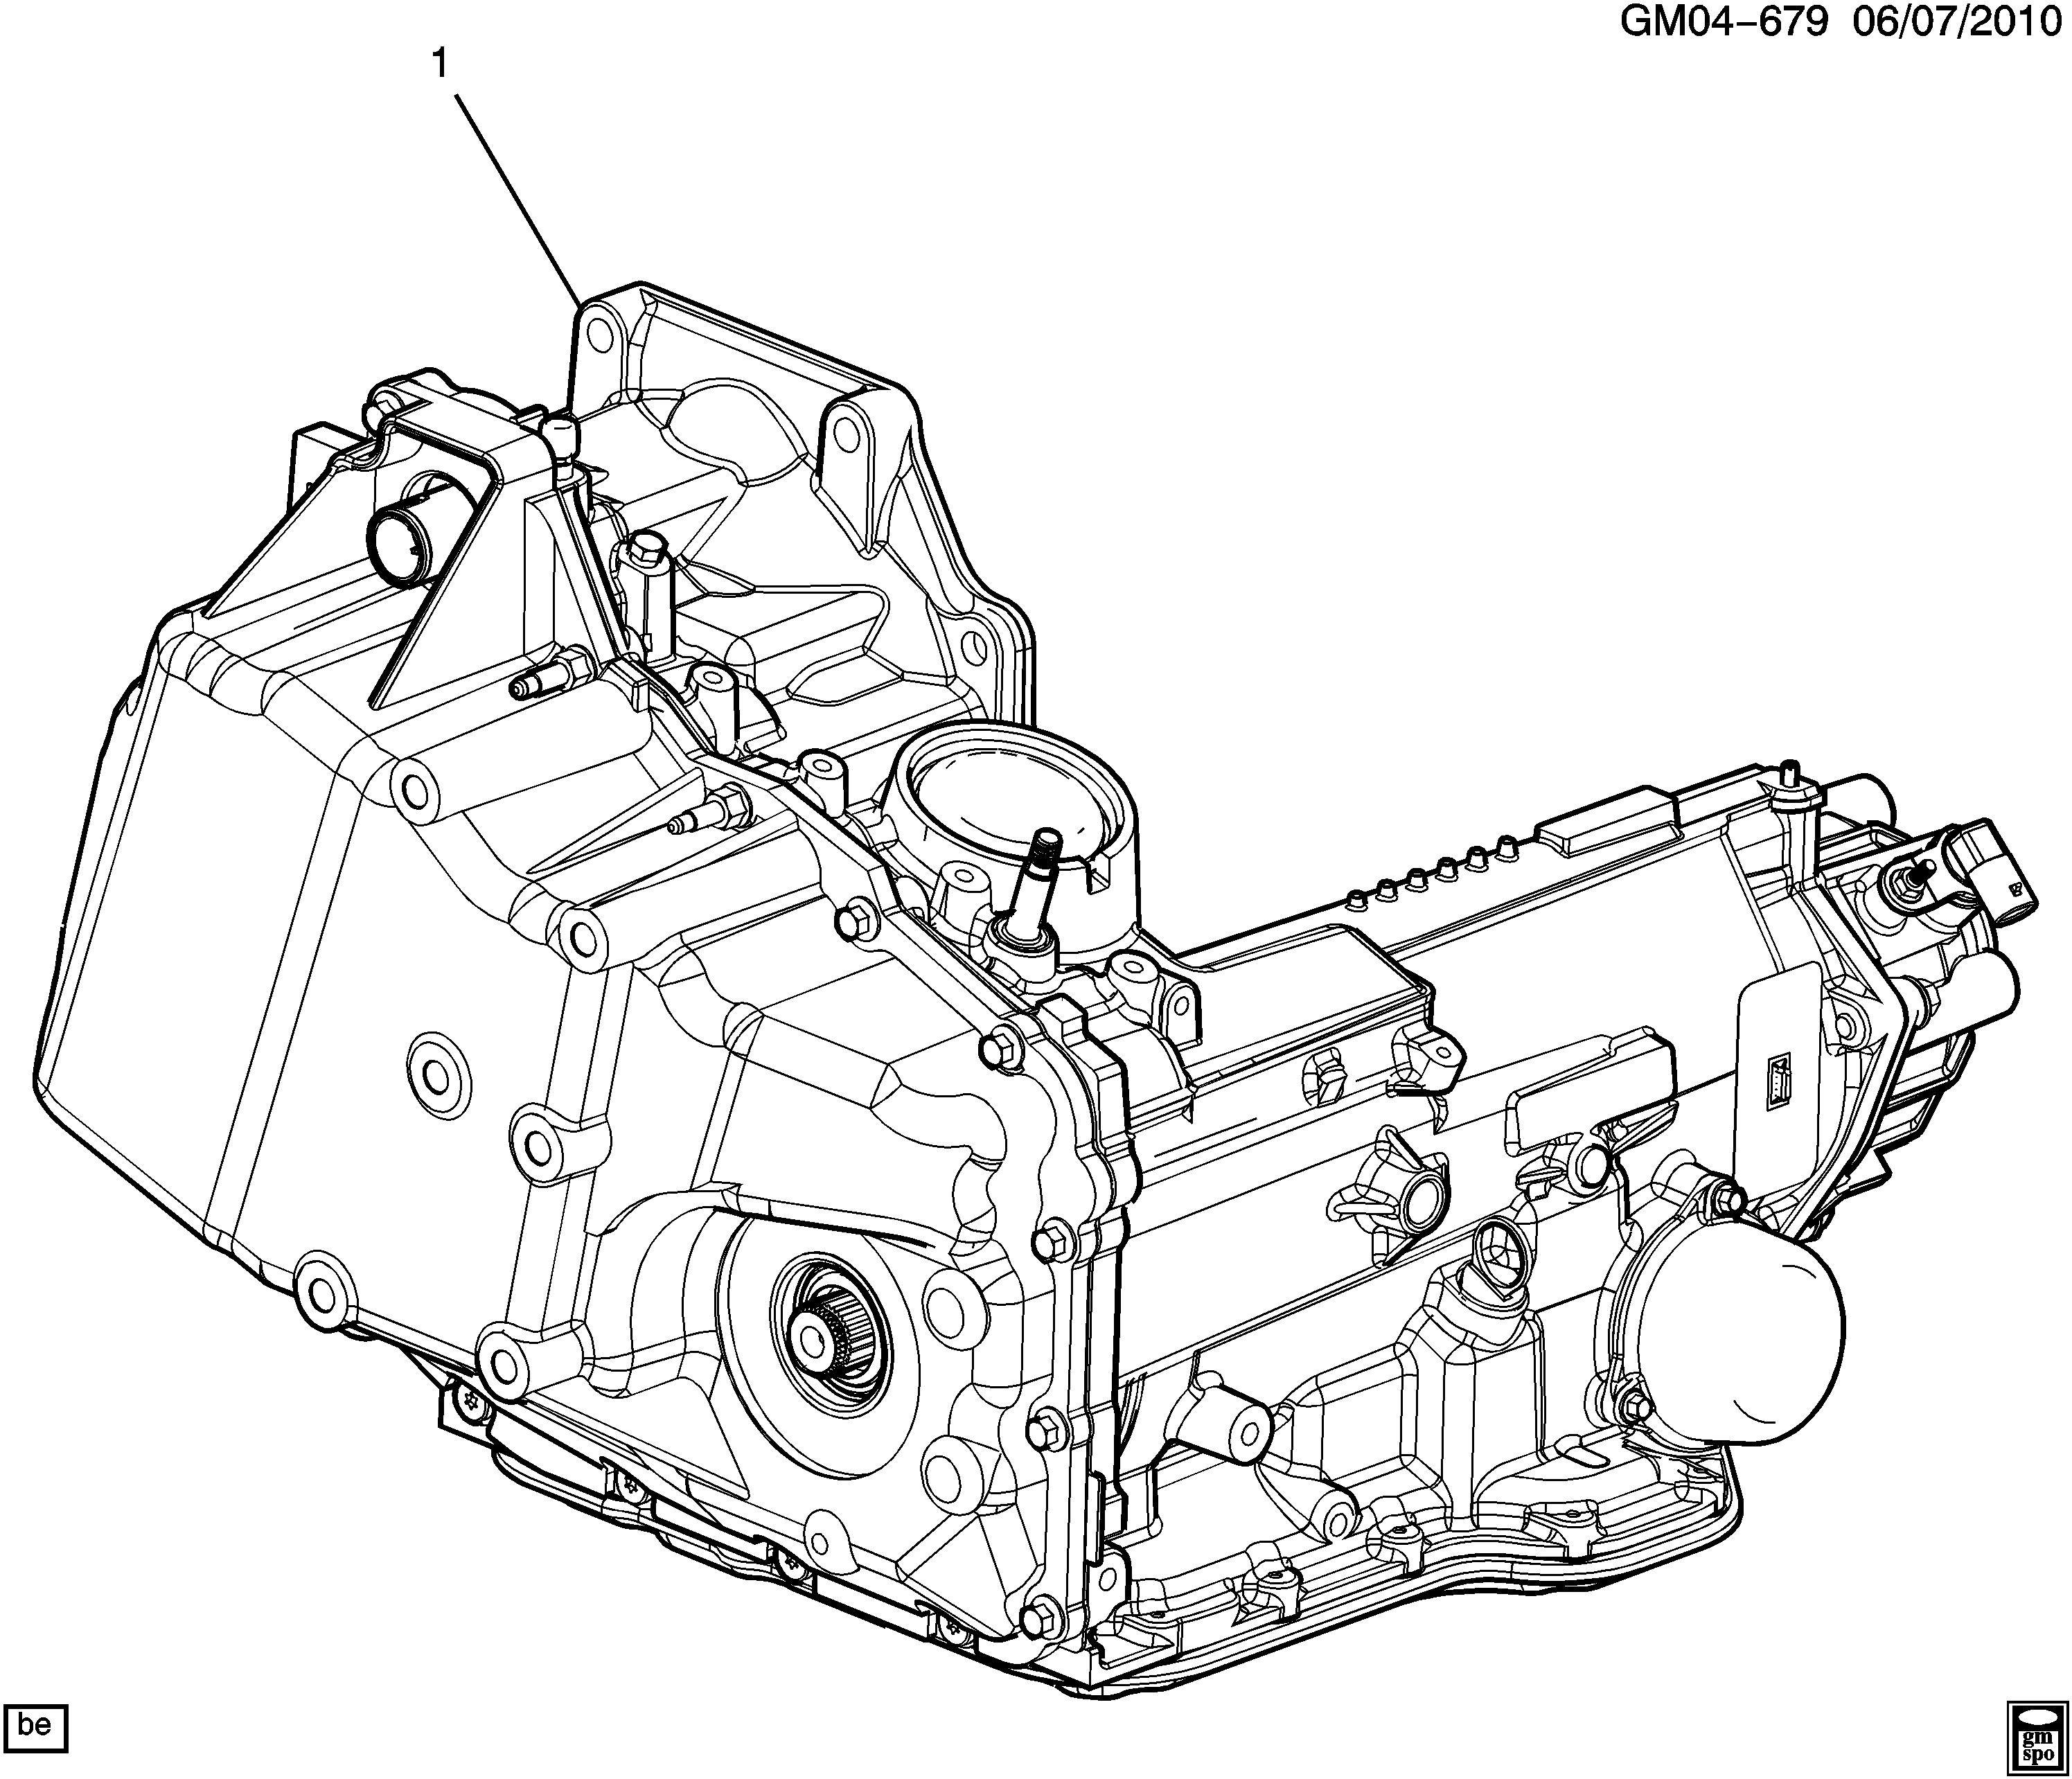 4t65e Parts Diagram - Wiring Diagrams List